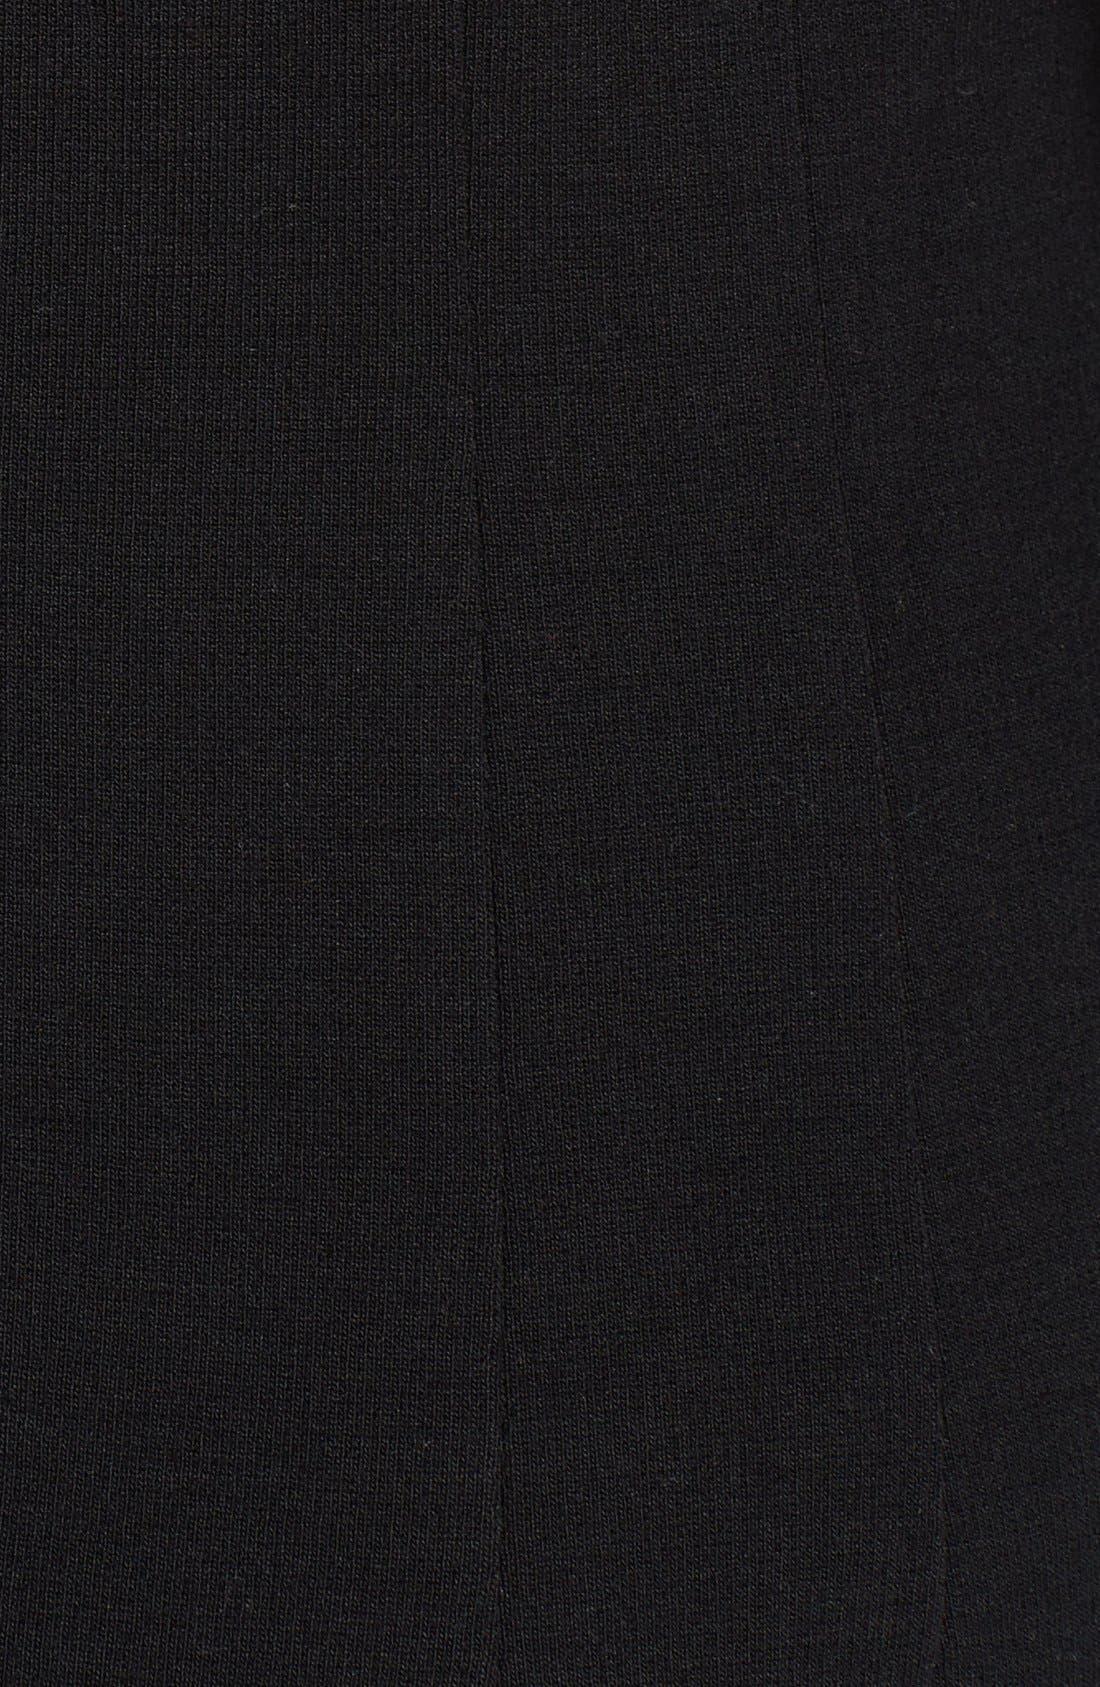 Alternate Image 3  - NIC+ZOE 'Spliced' Sheath Dress